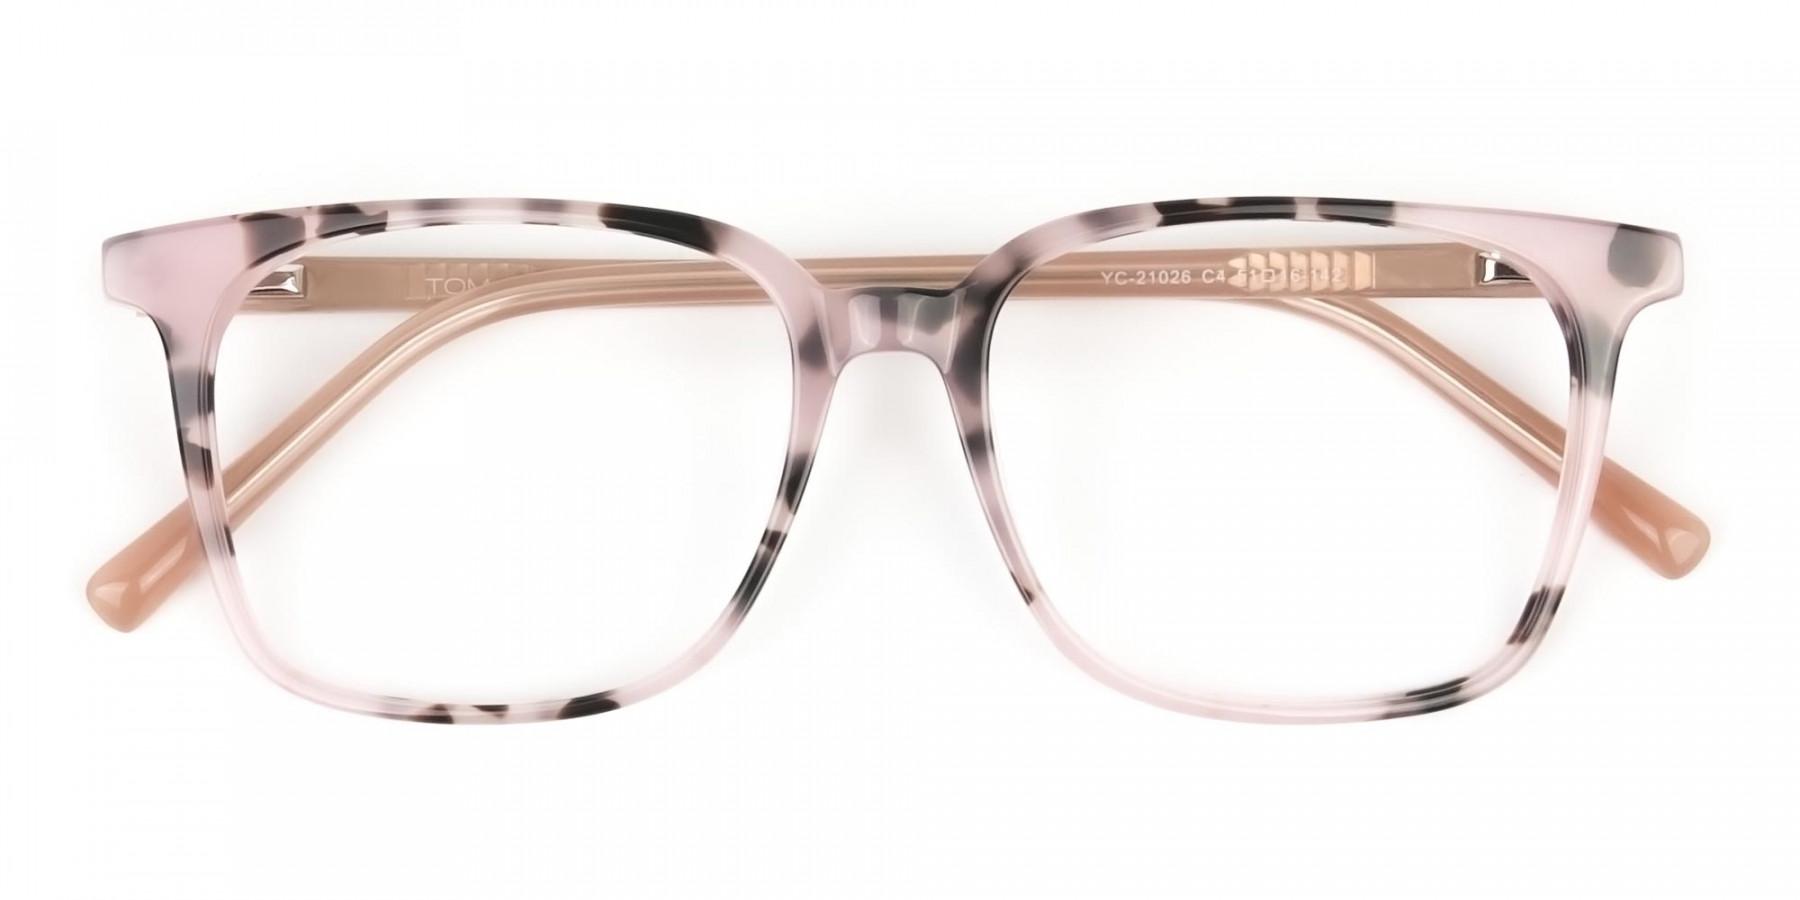 Wayfarer & Square Nude Tortoise Glasses - 1